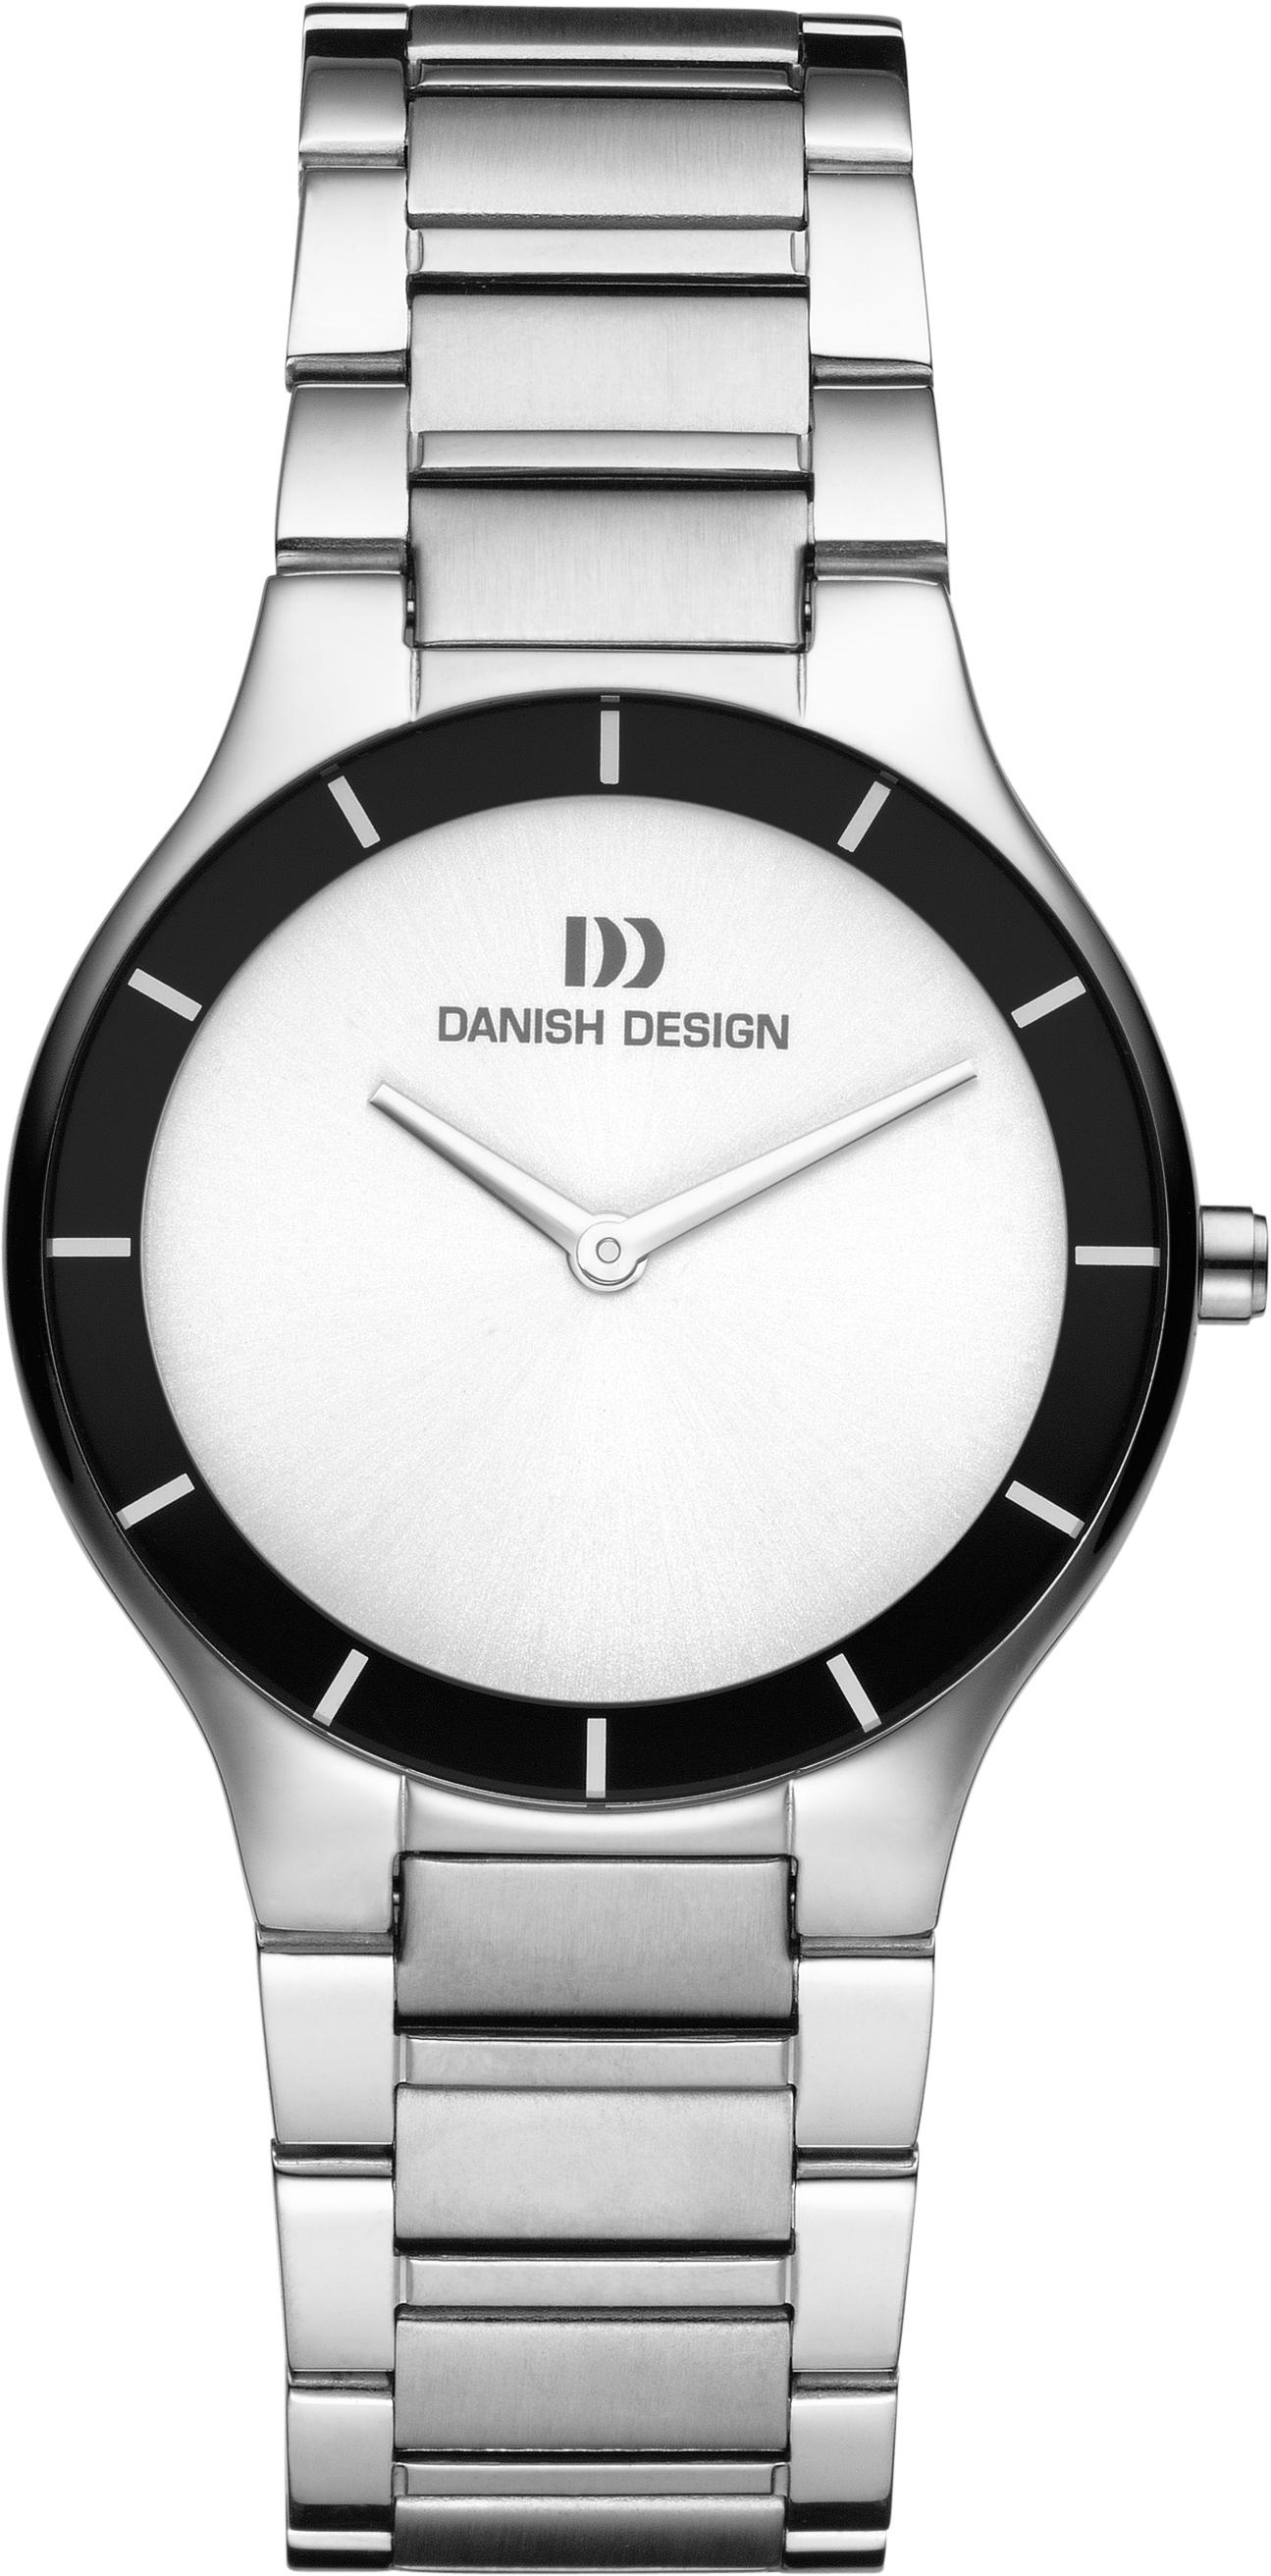 Danish Design Horloge 39 mm Stainless Steel IQ62Q949